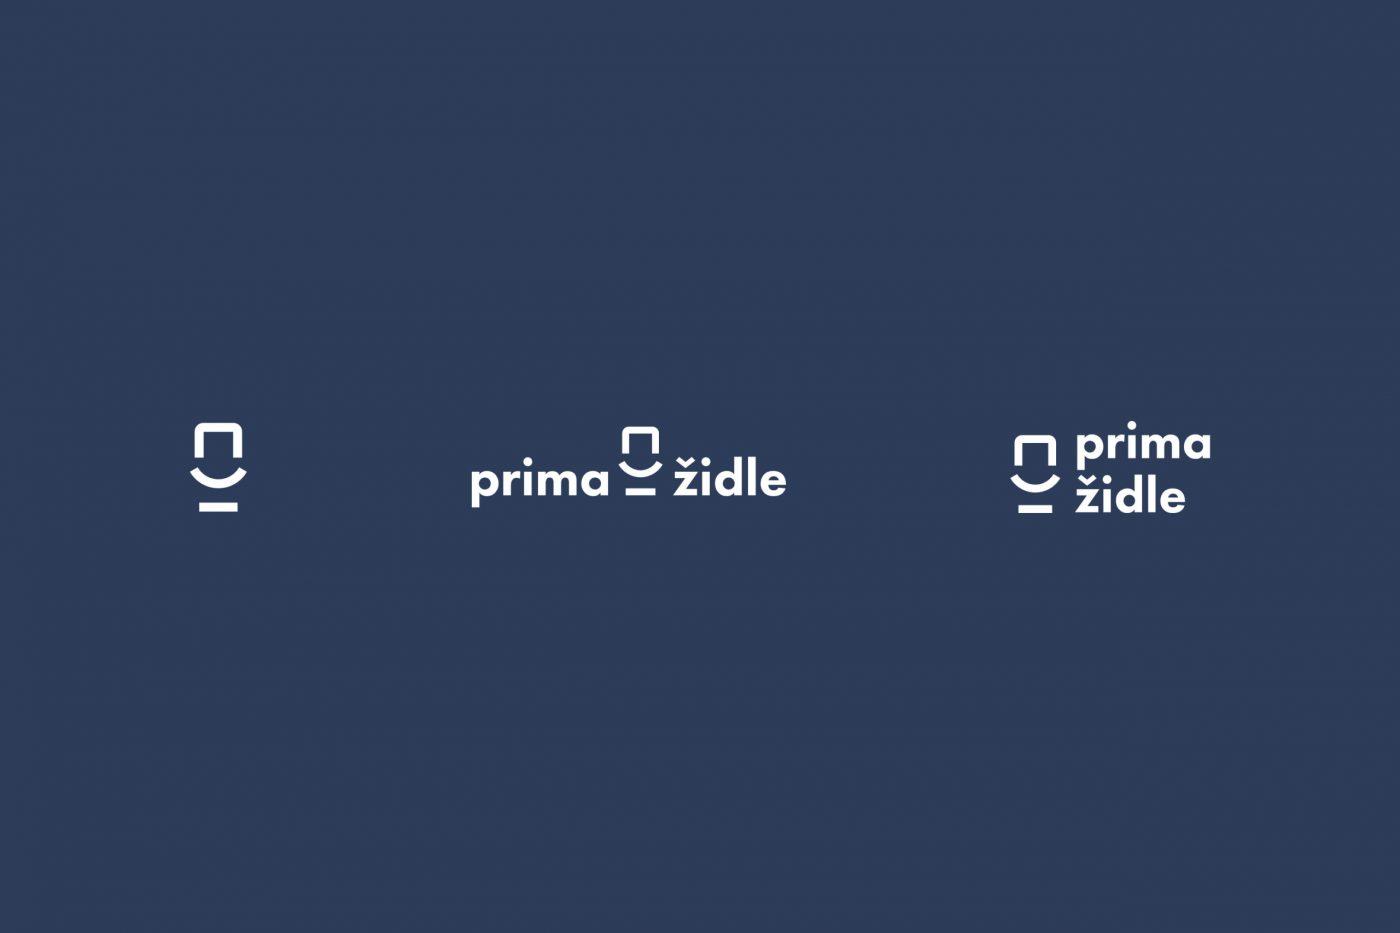 primazidle_logo